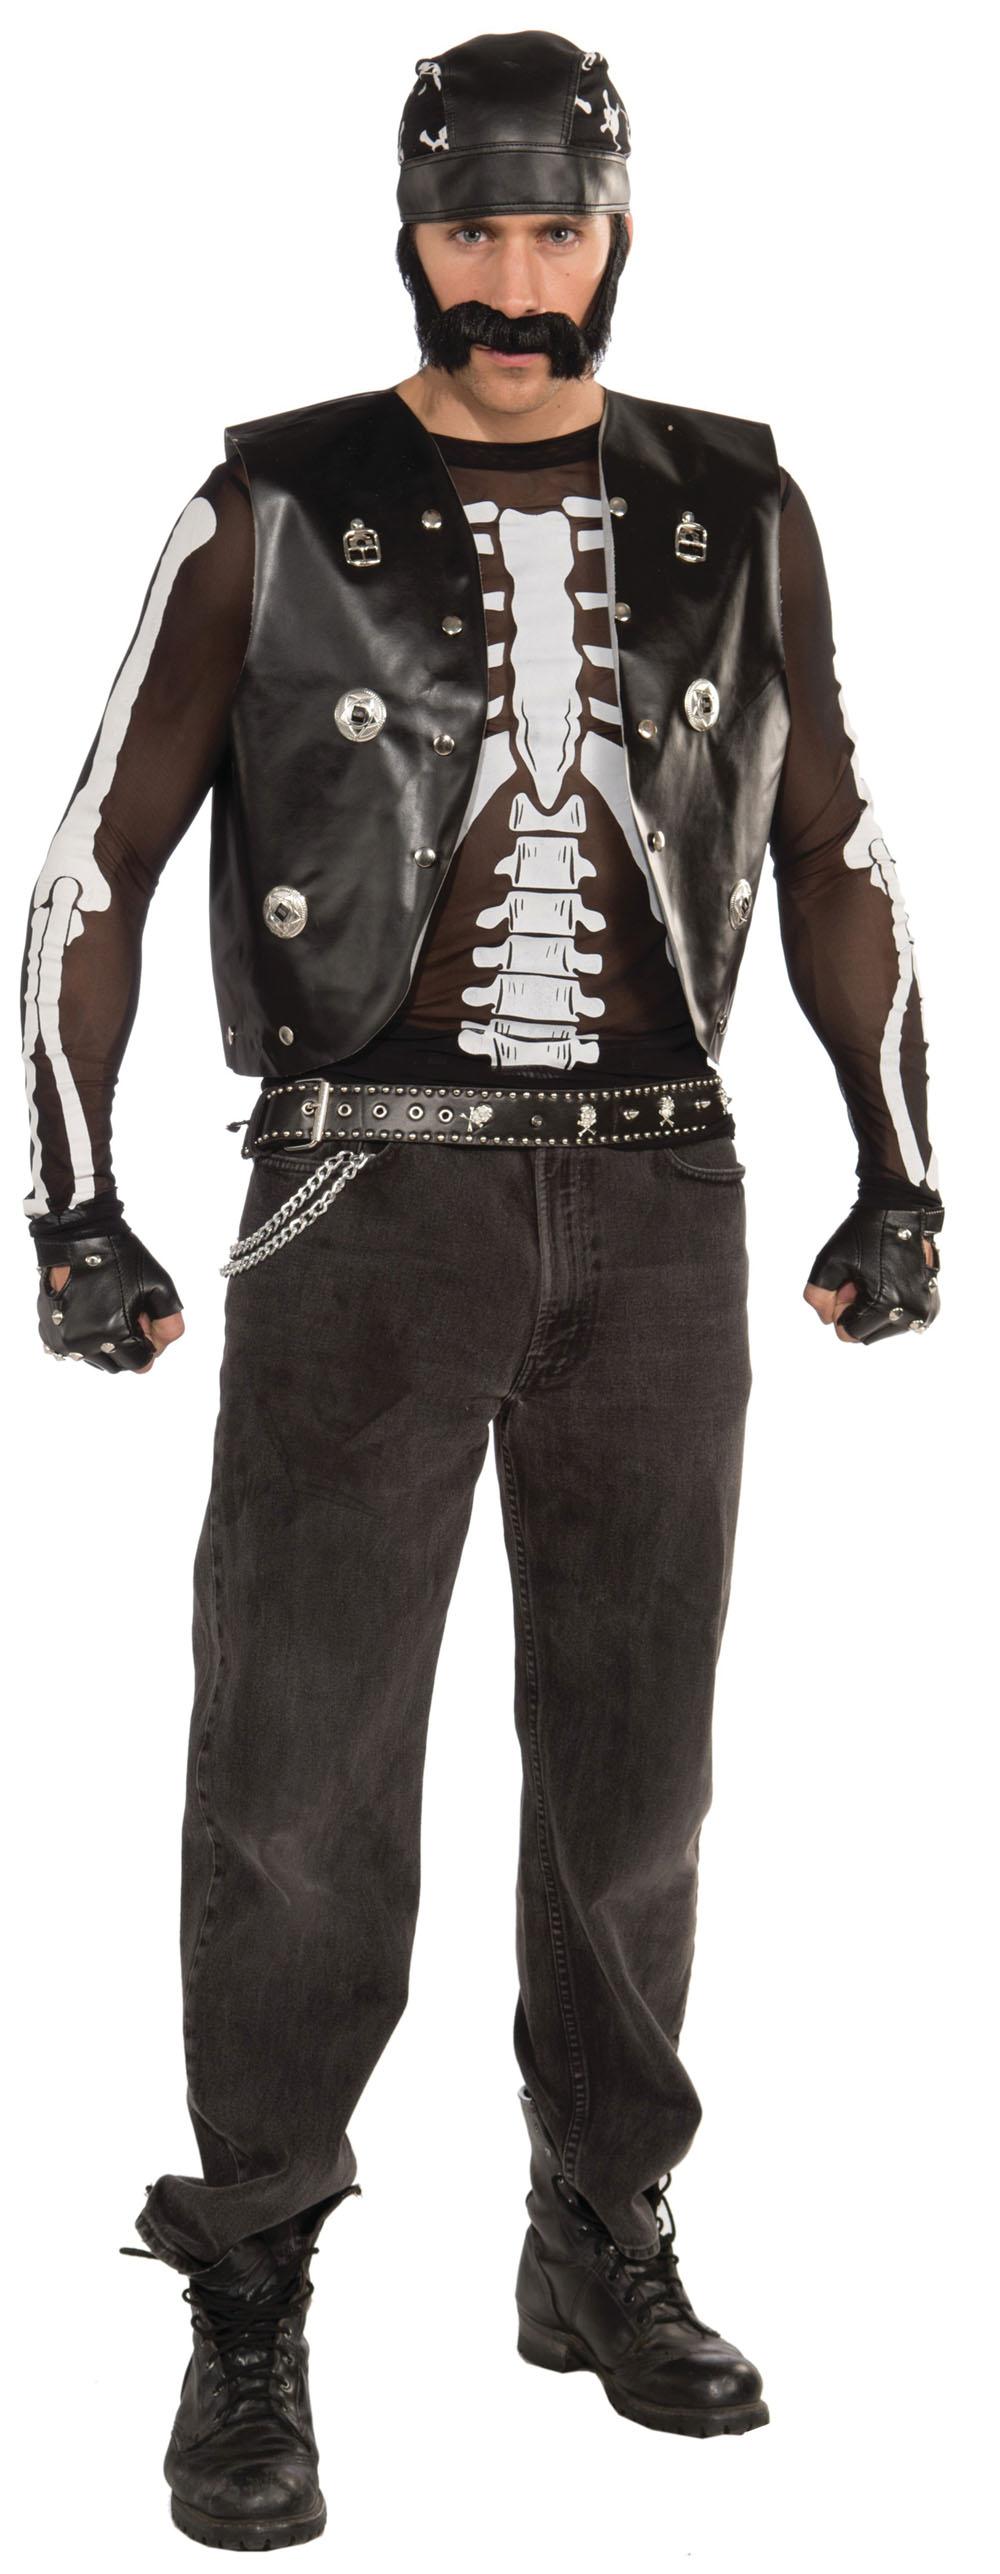 Unisex Black & White Skeleton Mesh Shirt Halloween Fancy Dress Costume Outfit